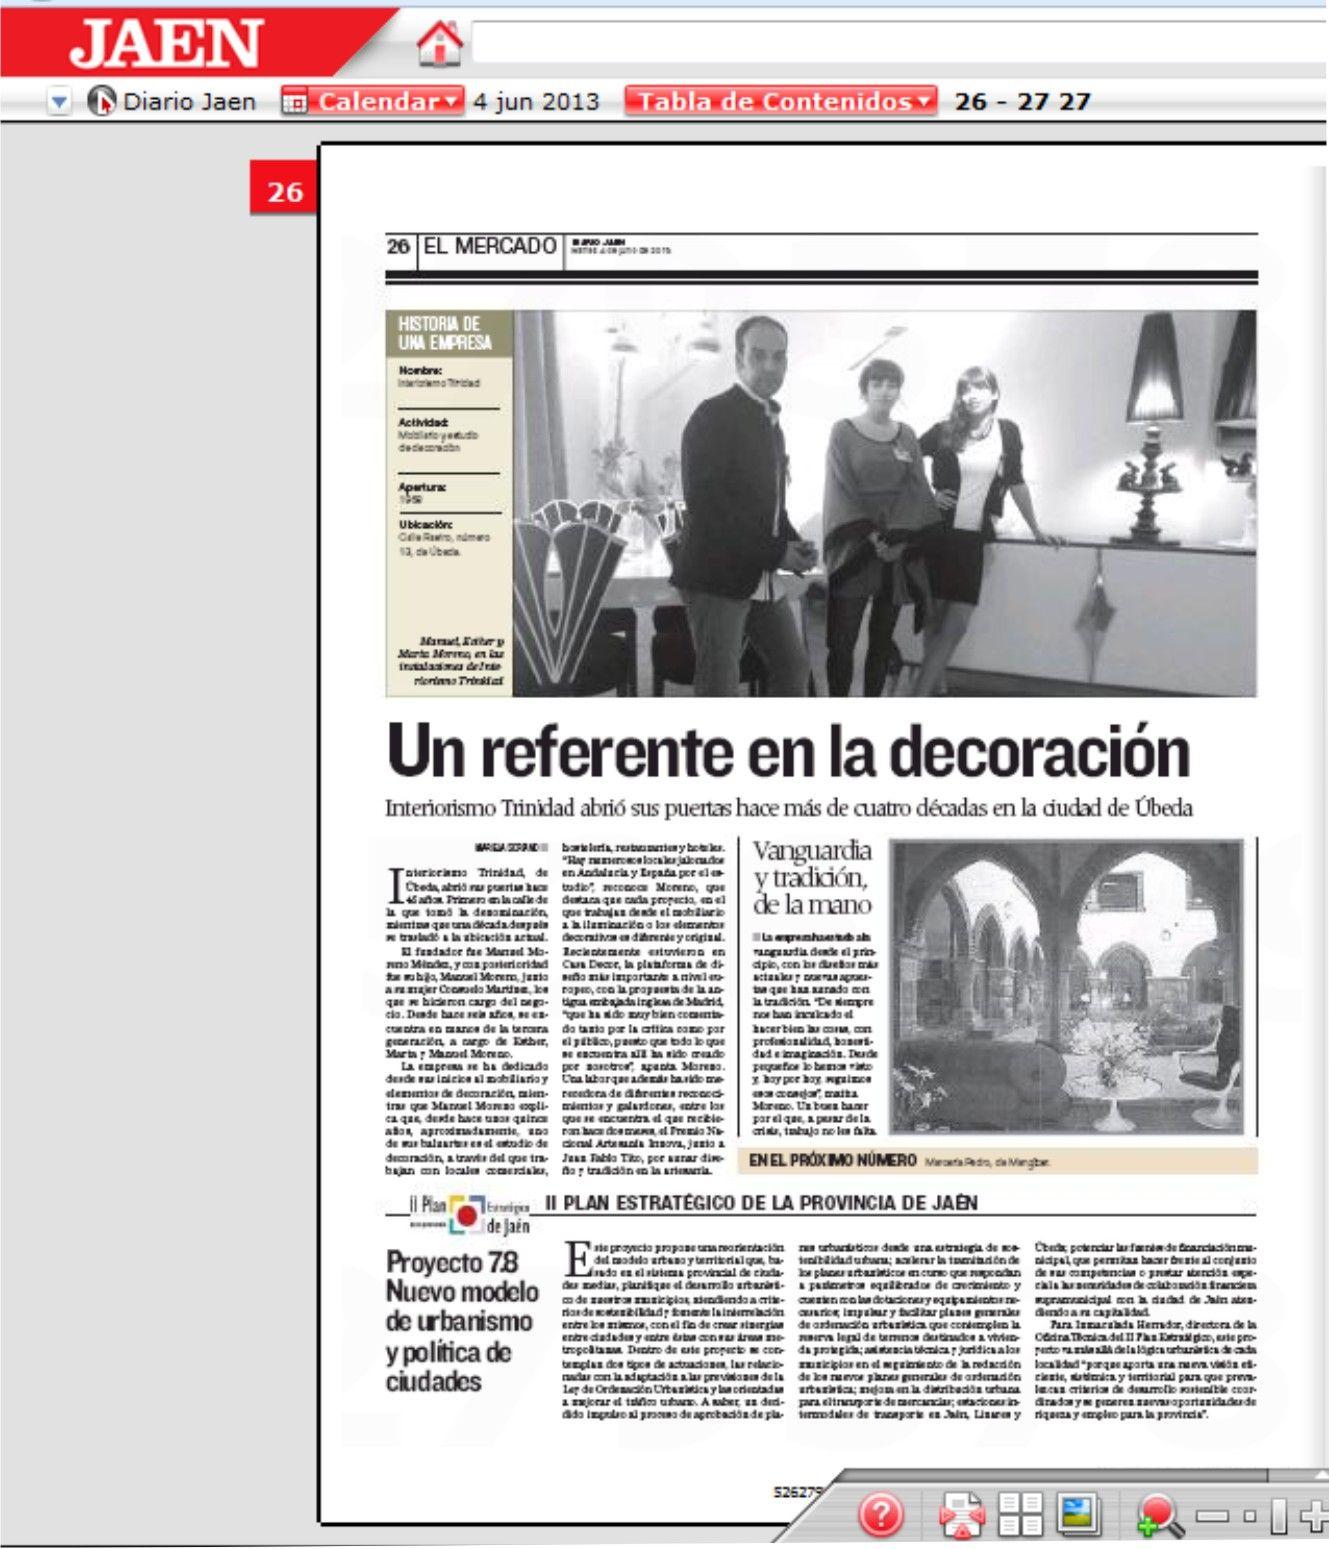 diariojaen more&more.jpg